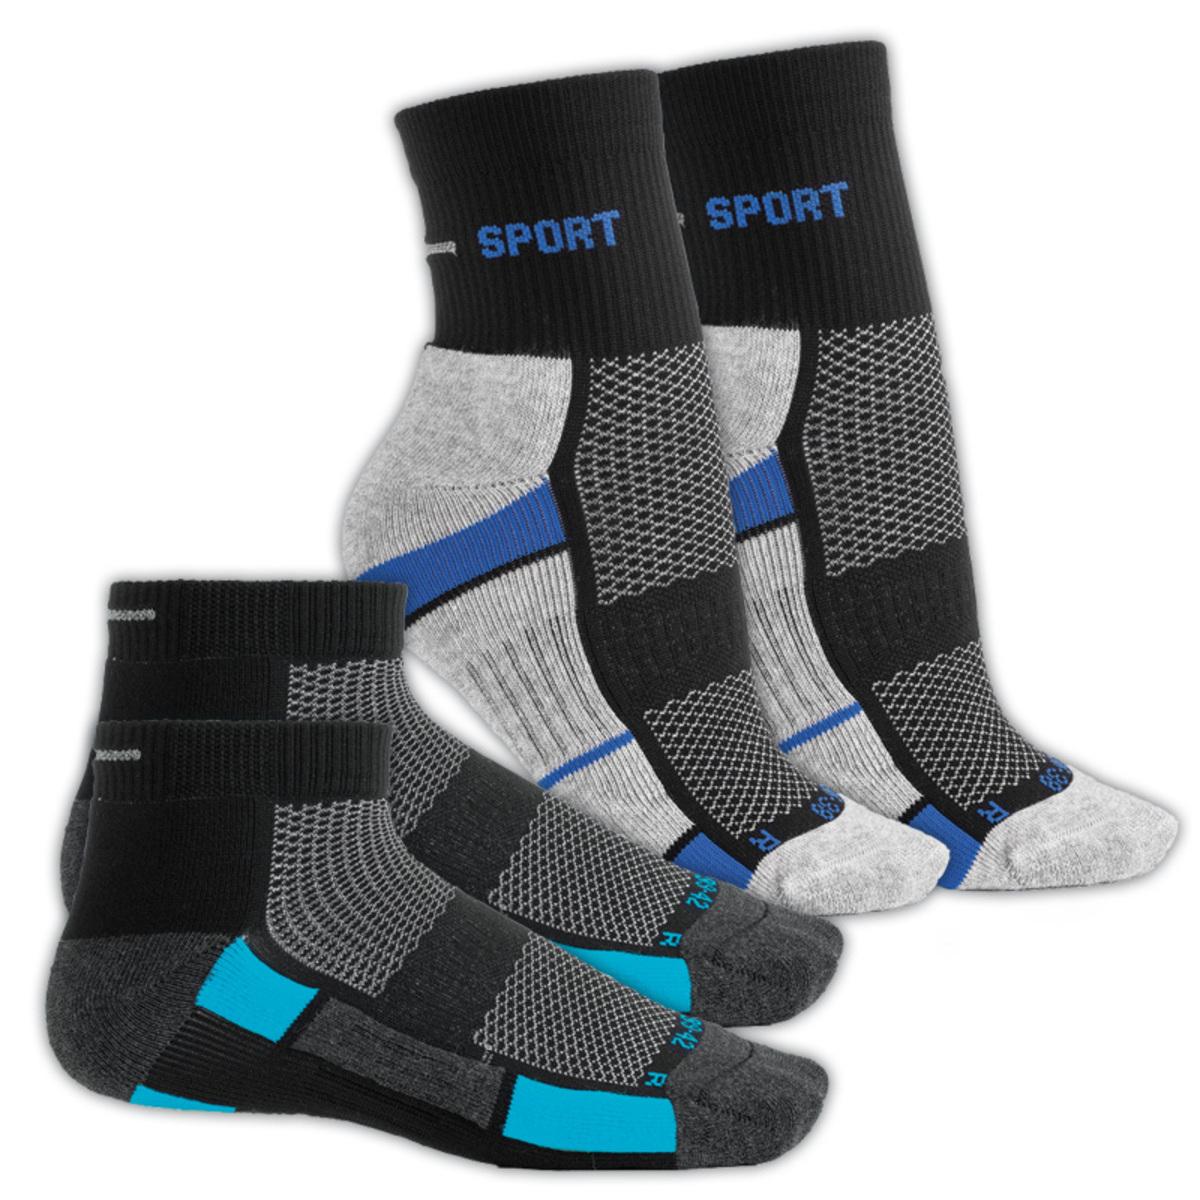 Bild 1 von Toptex Sport Sport-/ Outdoor Socken 2 Paar